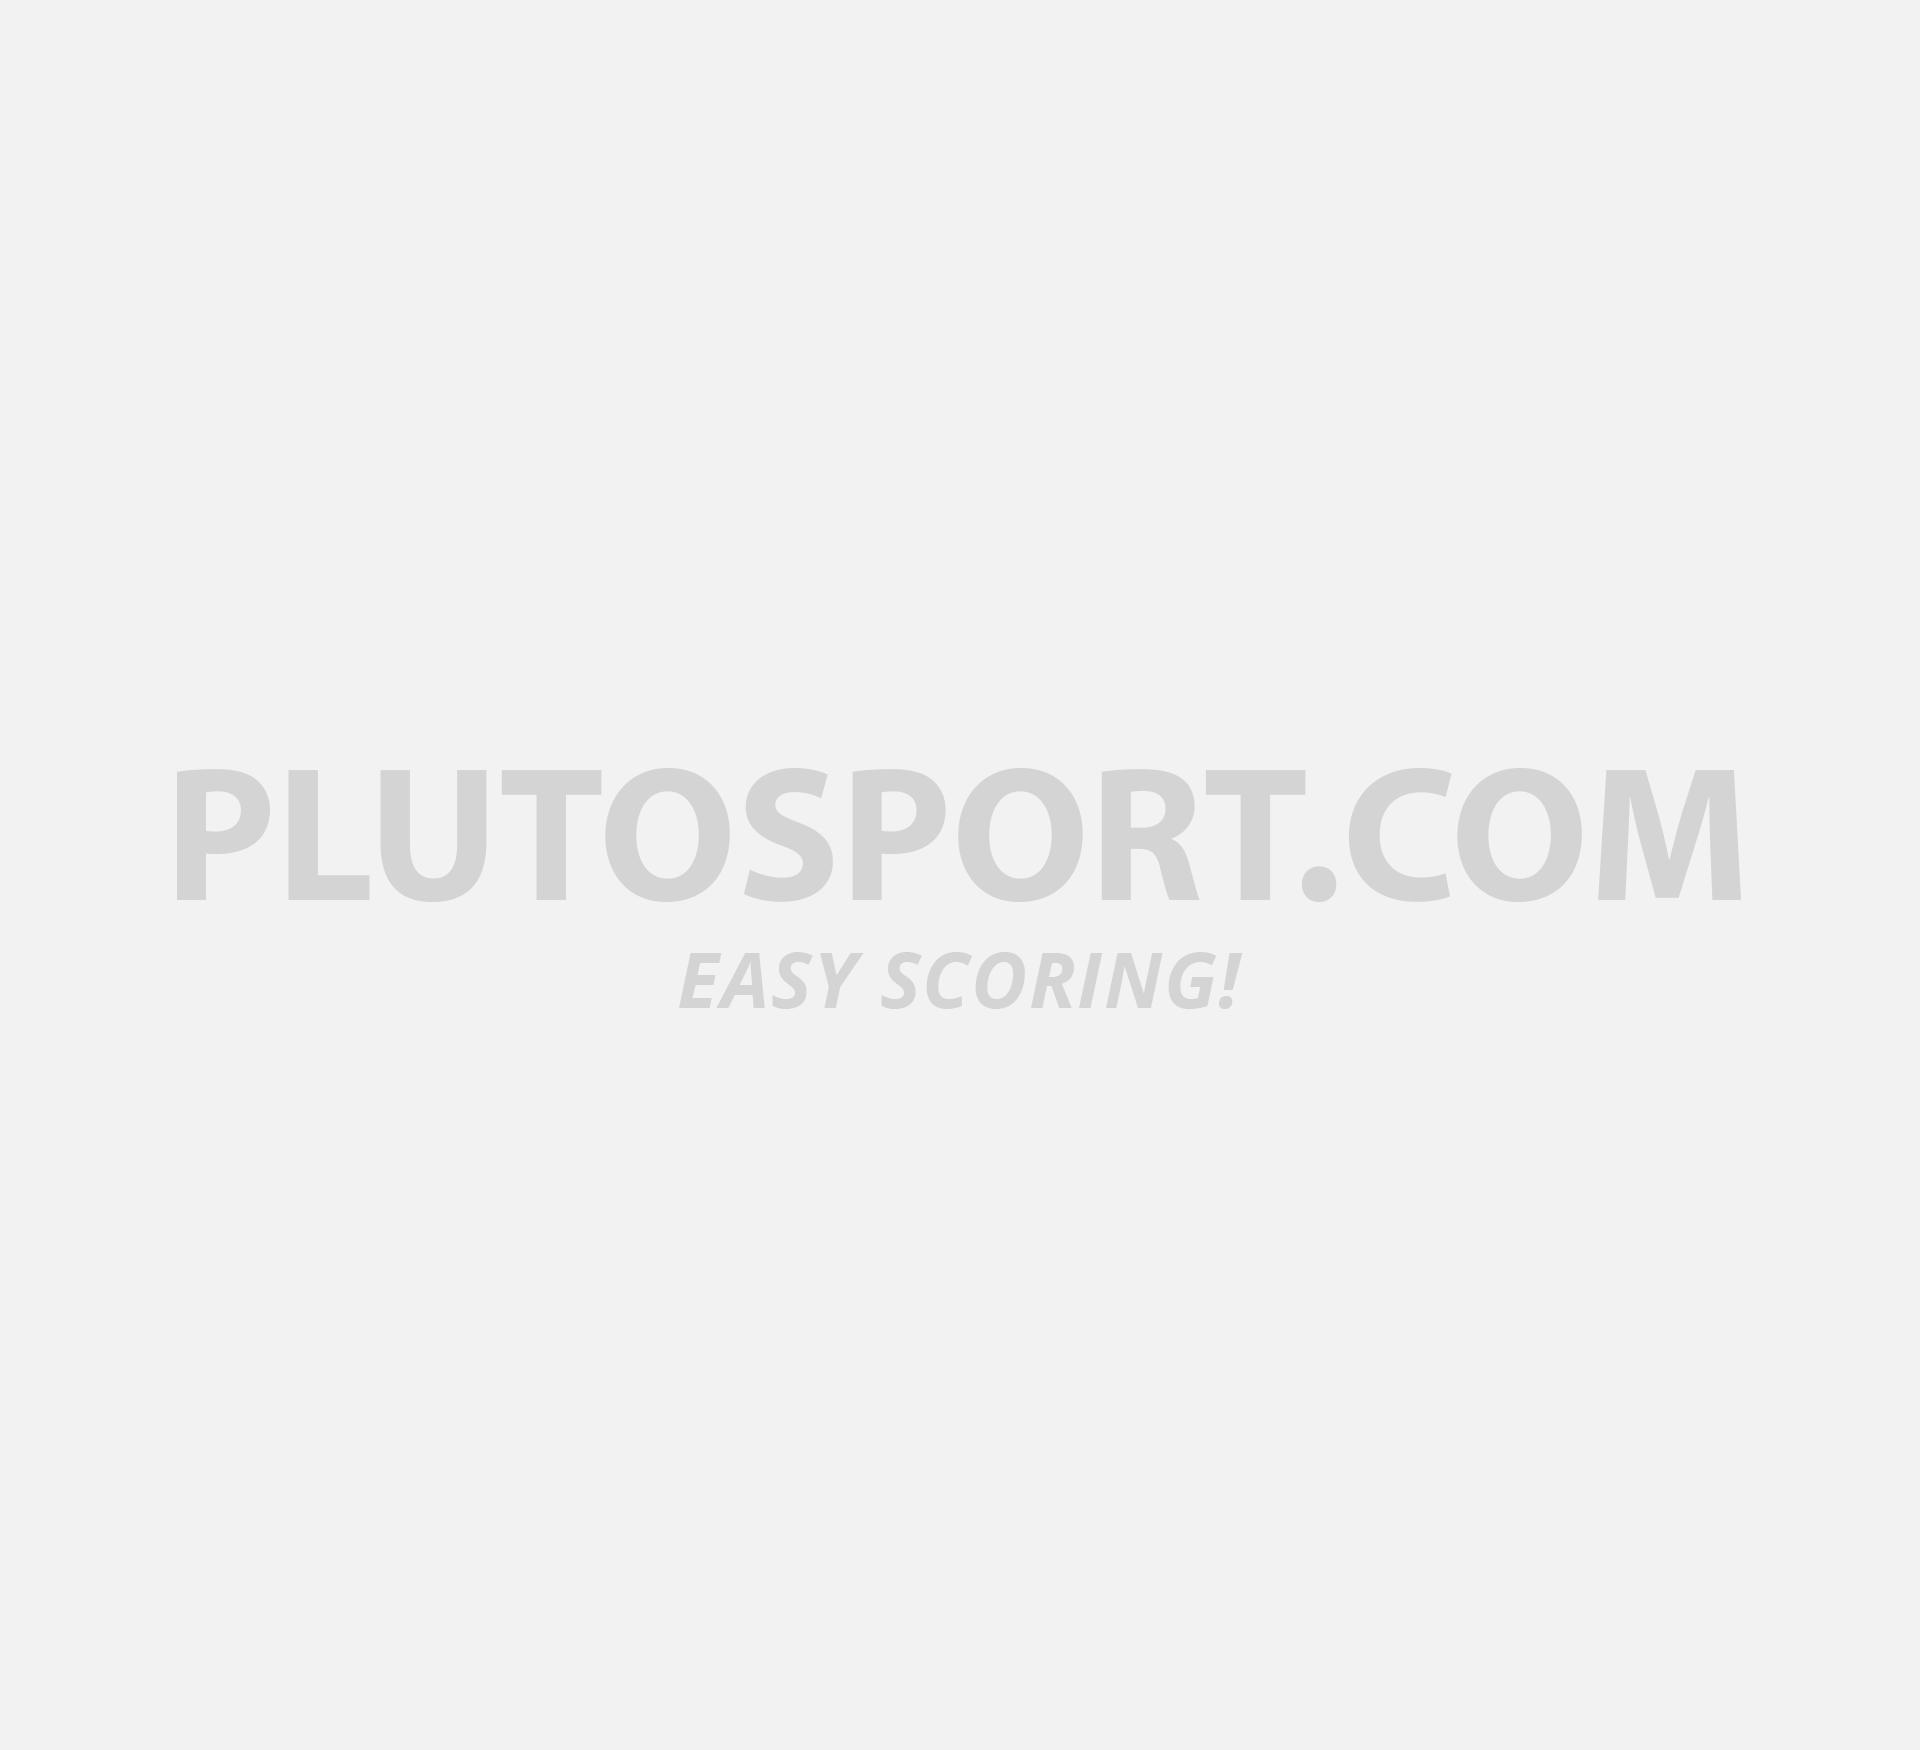 adidas zx 500 2.0 prix